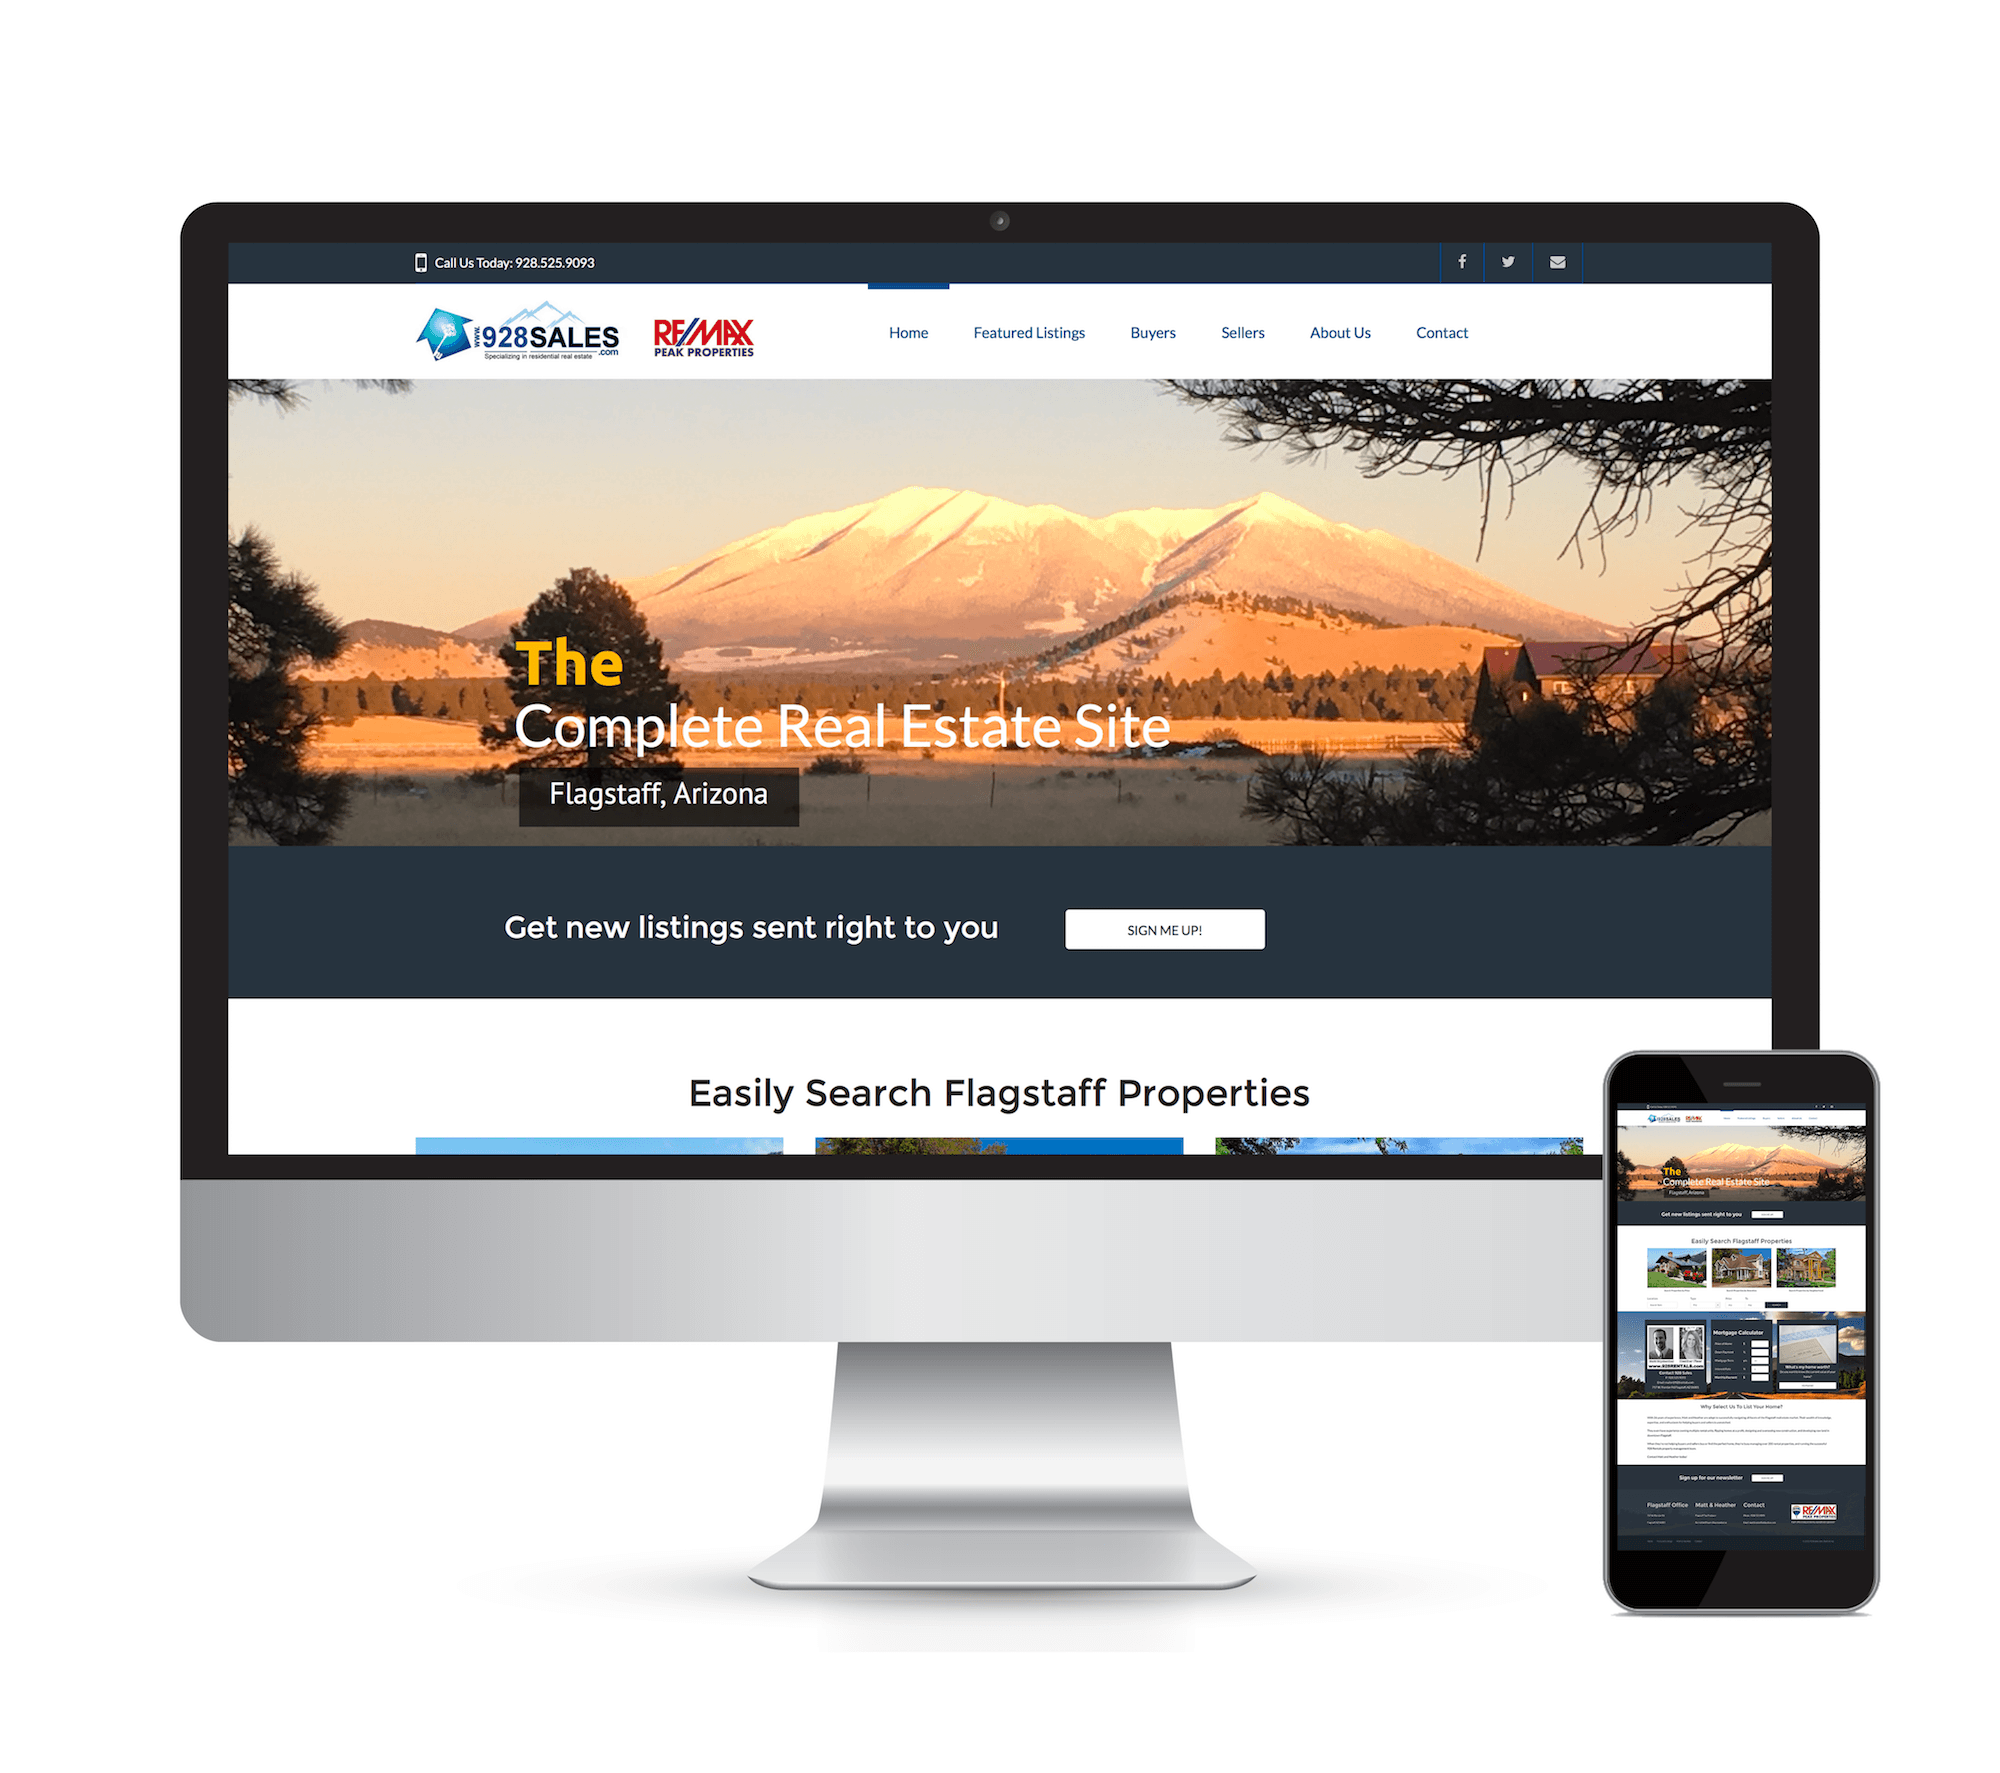 928sales website design copy compressor website design for Copy design